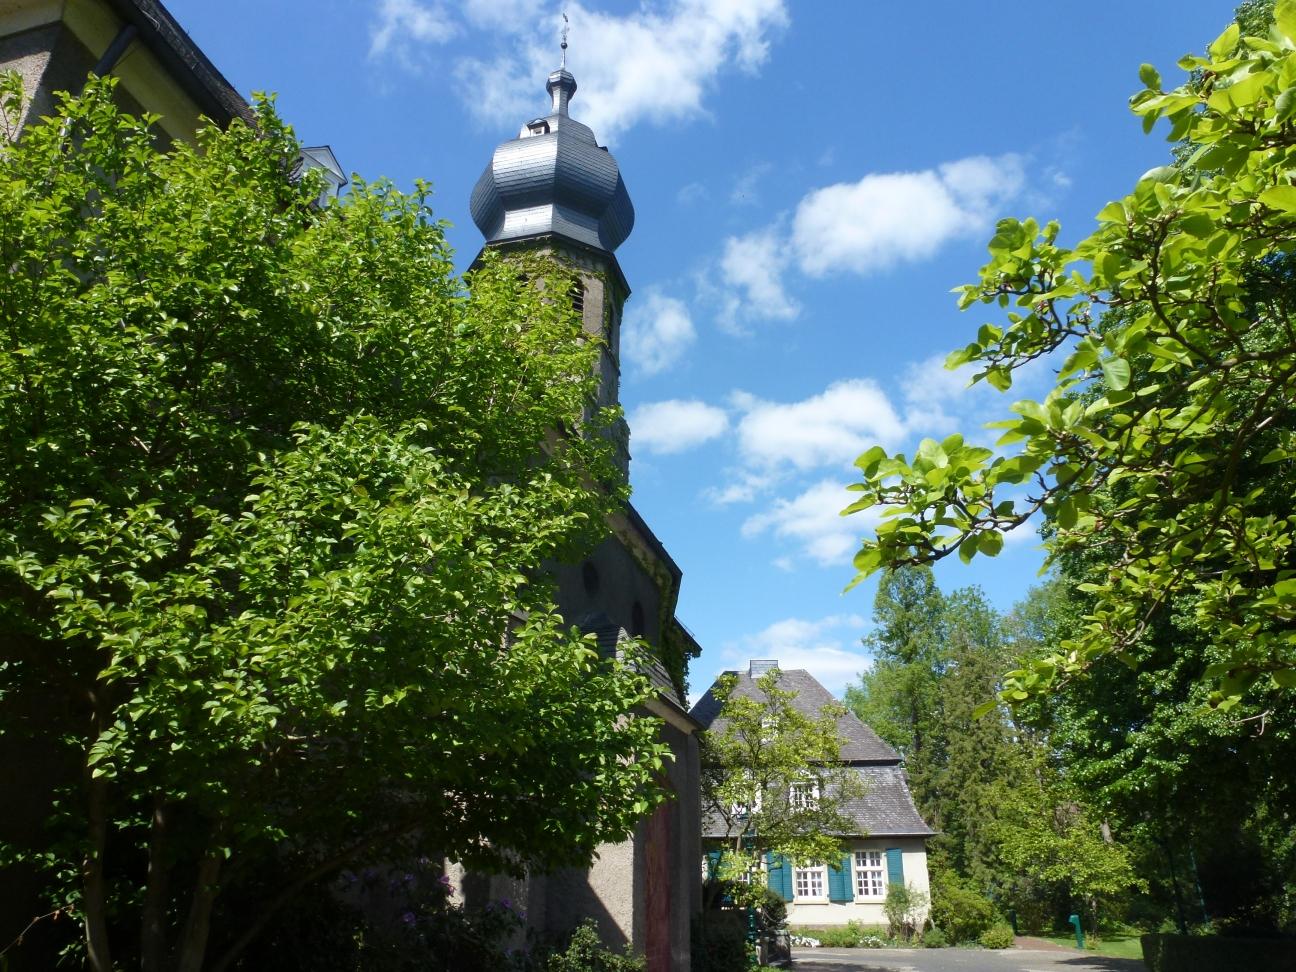 St. Hubertus, Rahm (© Hermann-Josef Brandt)